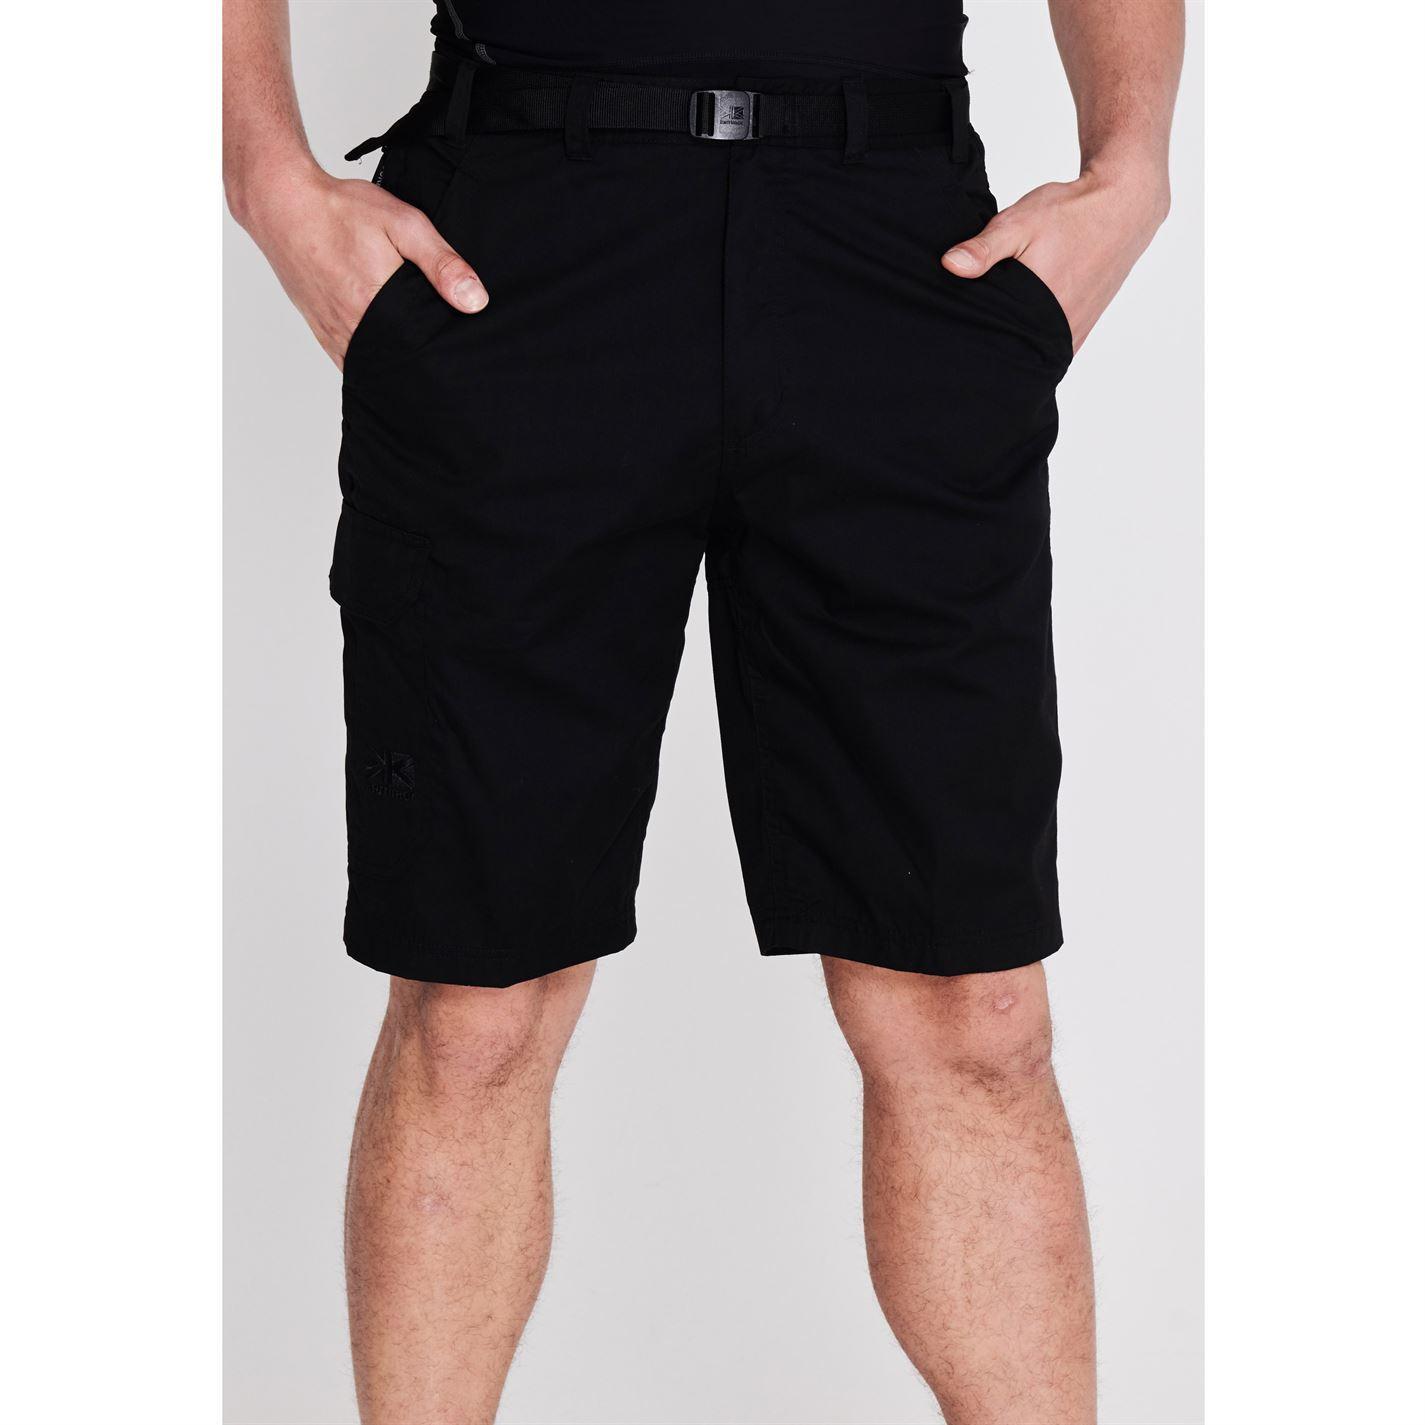 Karrimor Munro Pantalones cortos para hombre